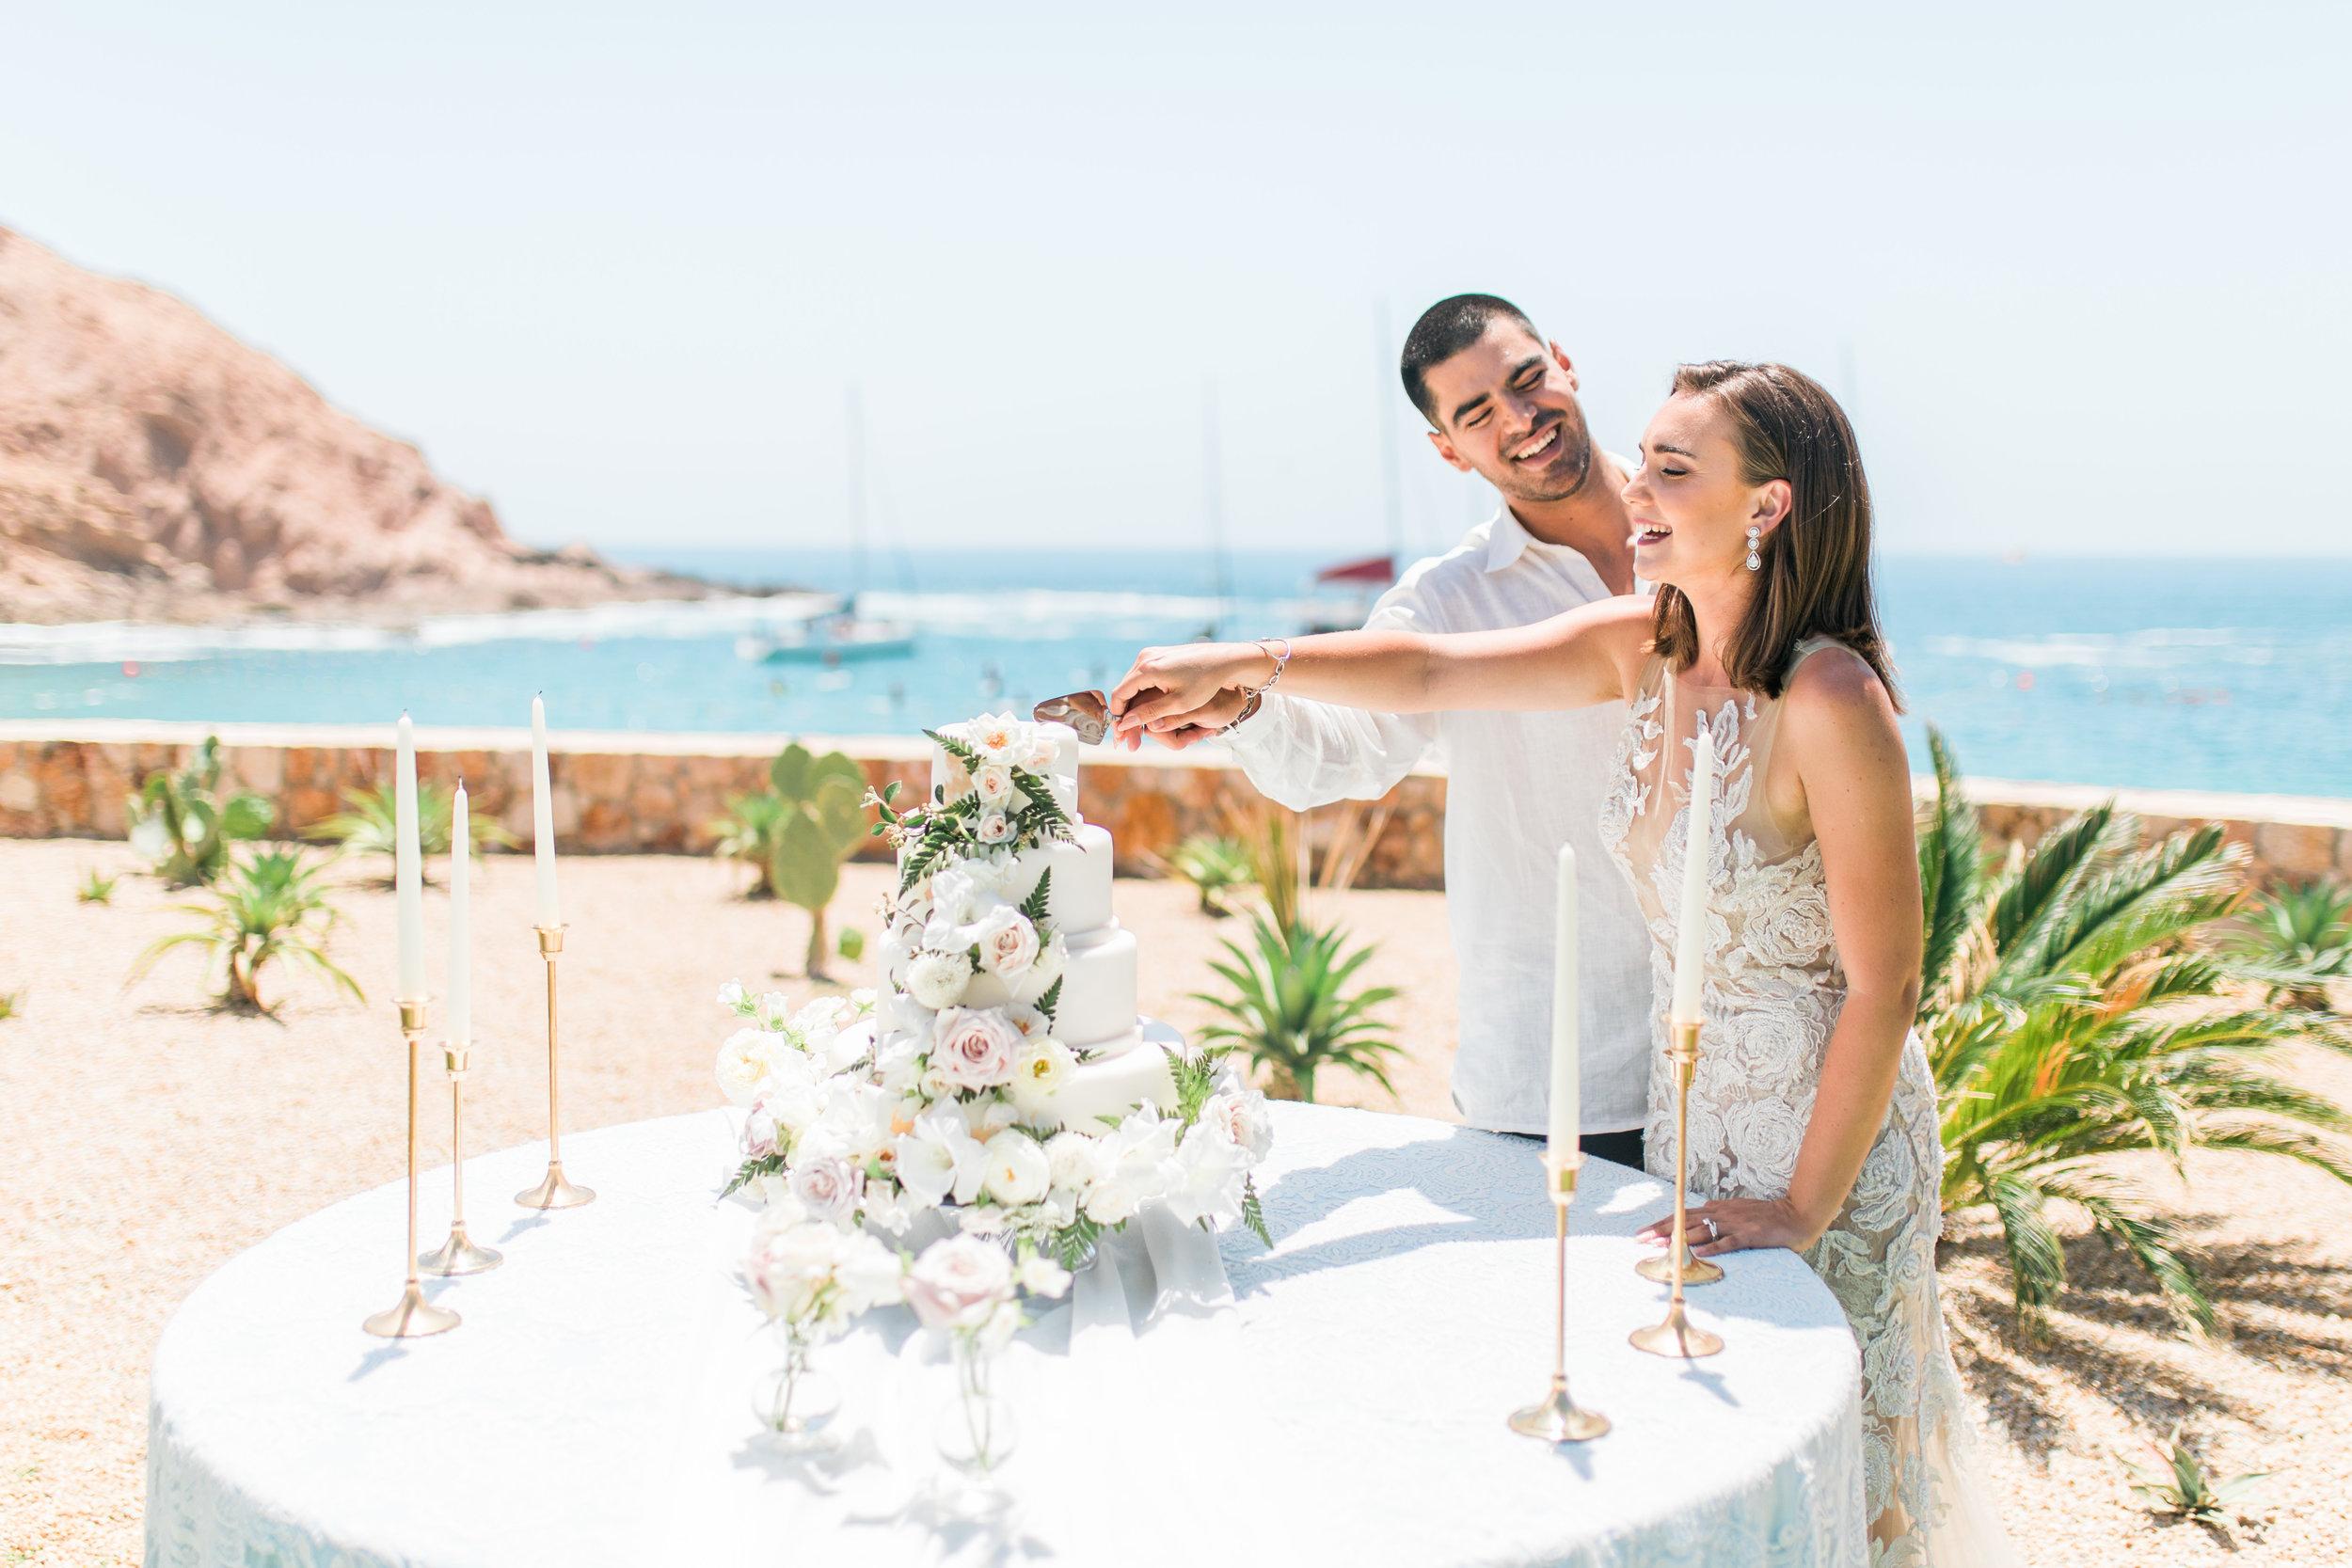 Montage-Wedding-Photos-Cabo-JBJ-Pictures-165.jpg